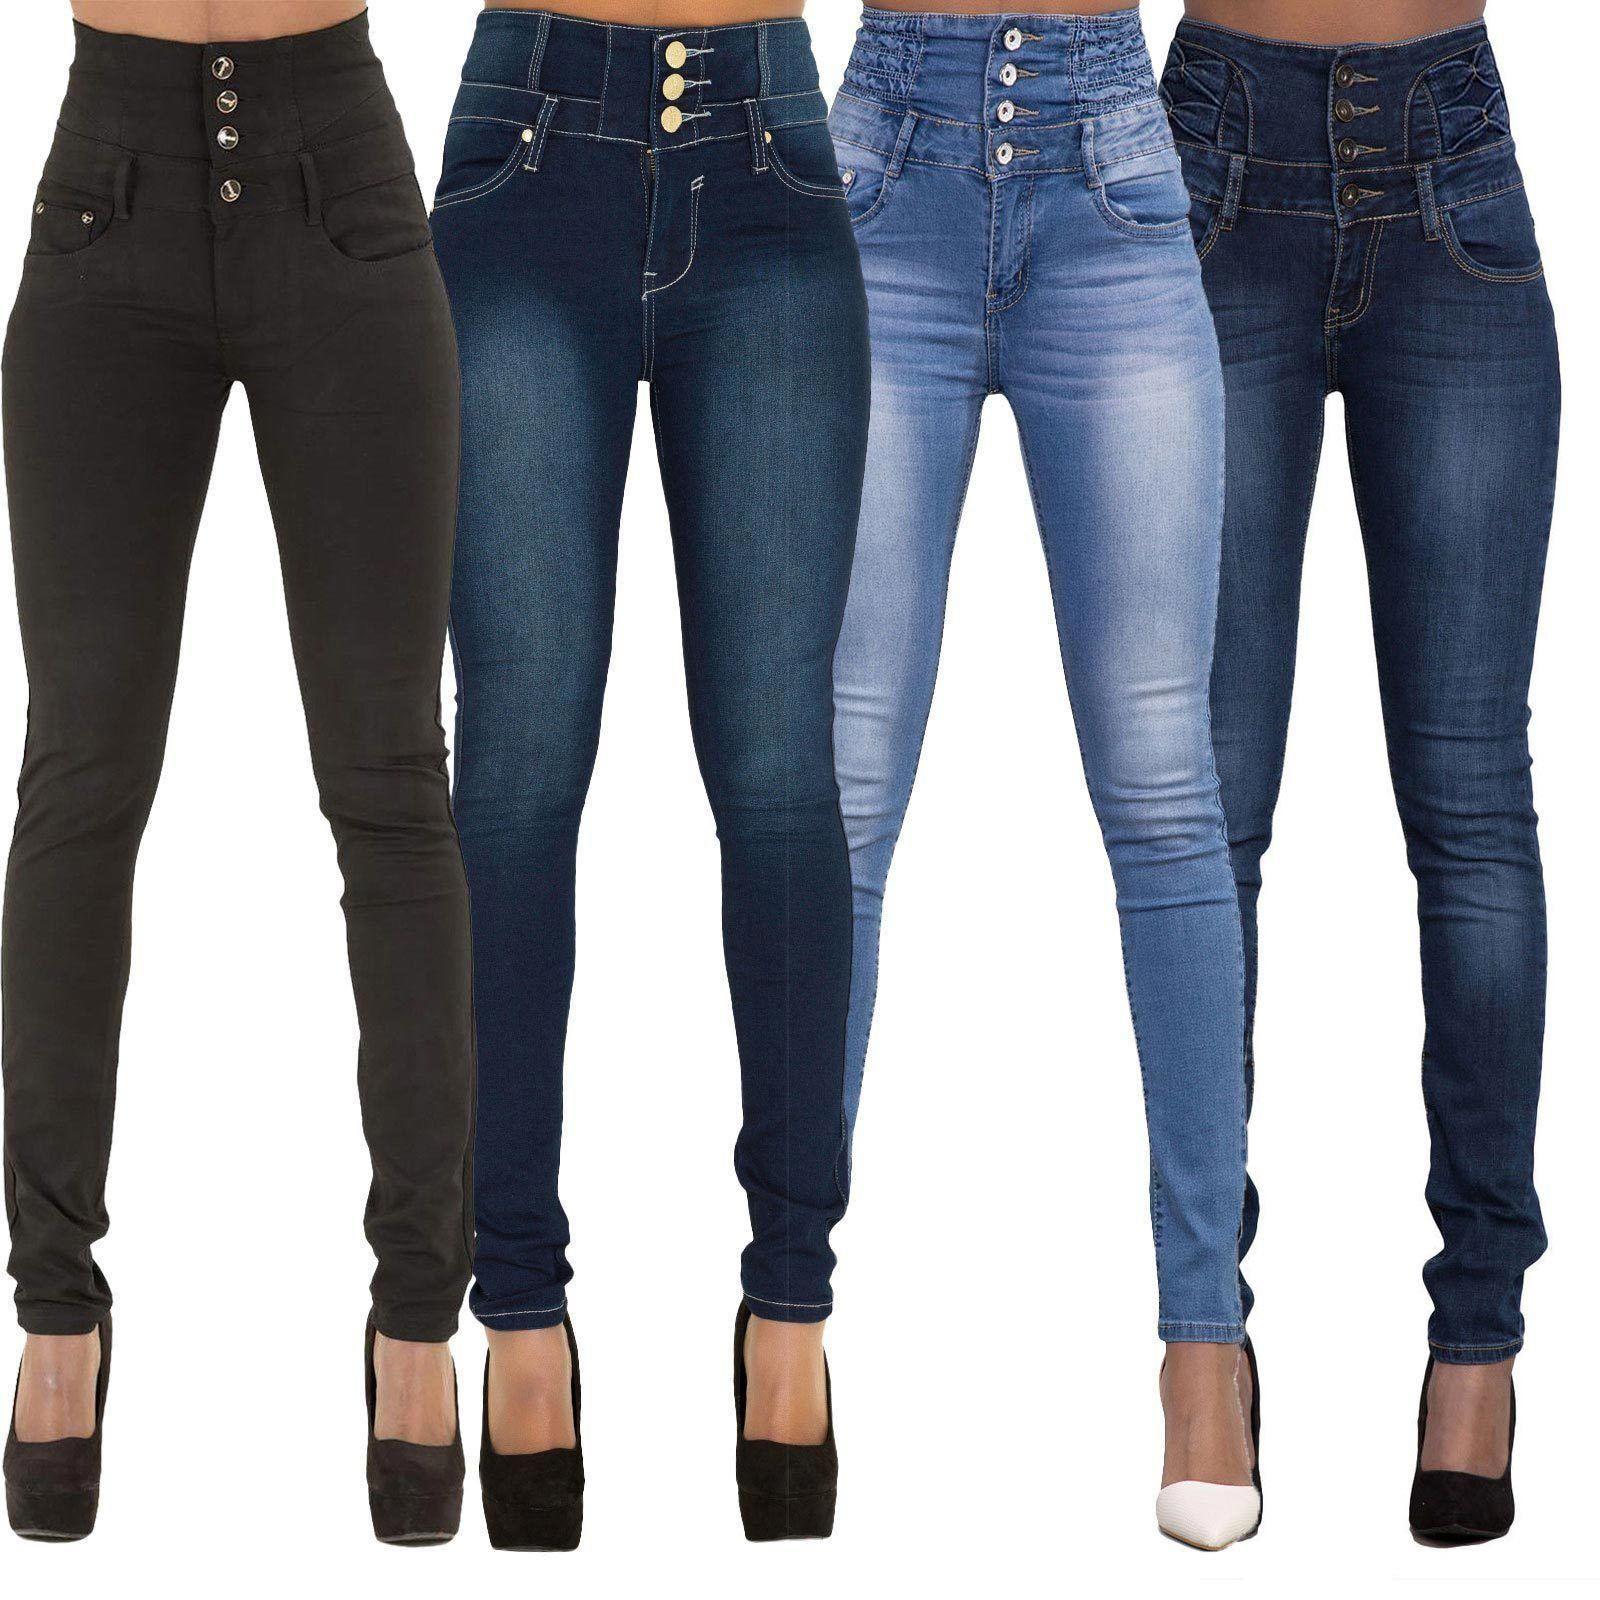 Women's High Waist Slim Stretch Large Size Feet Jeans Skinny Jeans Woman High Waist Jeans Womens Clothing Plus Size Skinny 2020